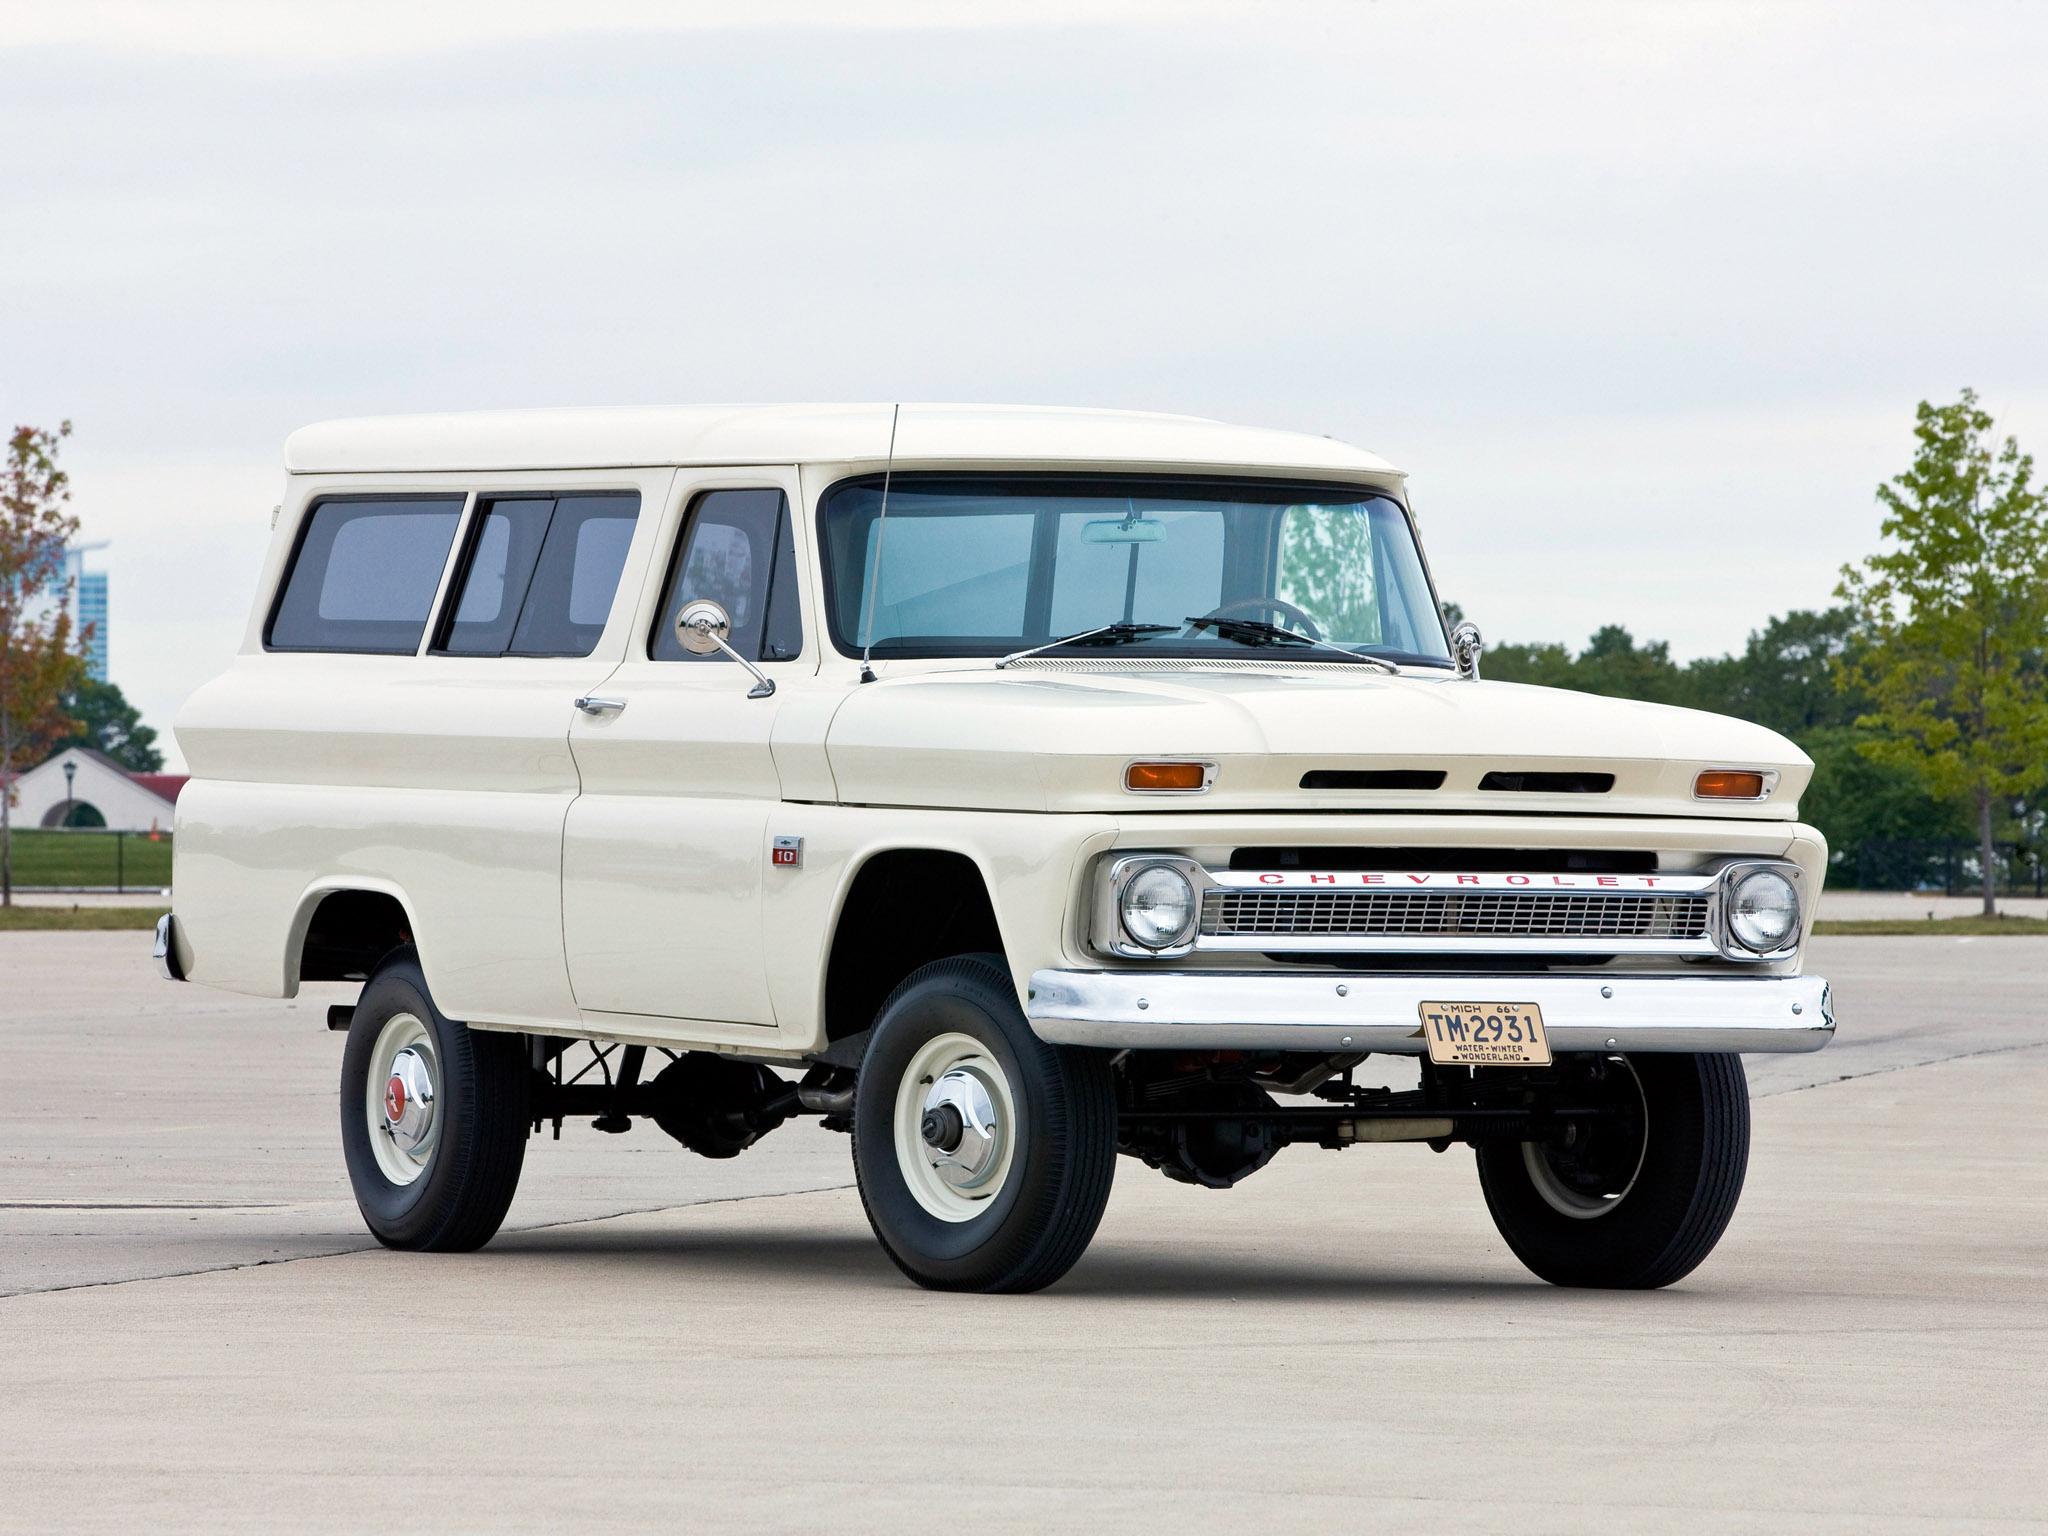 1965 Chevrolet Suburban 4x4 truck classic wallpaper 2048x1536 2048x1536